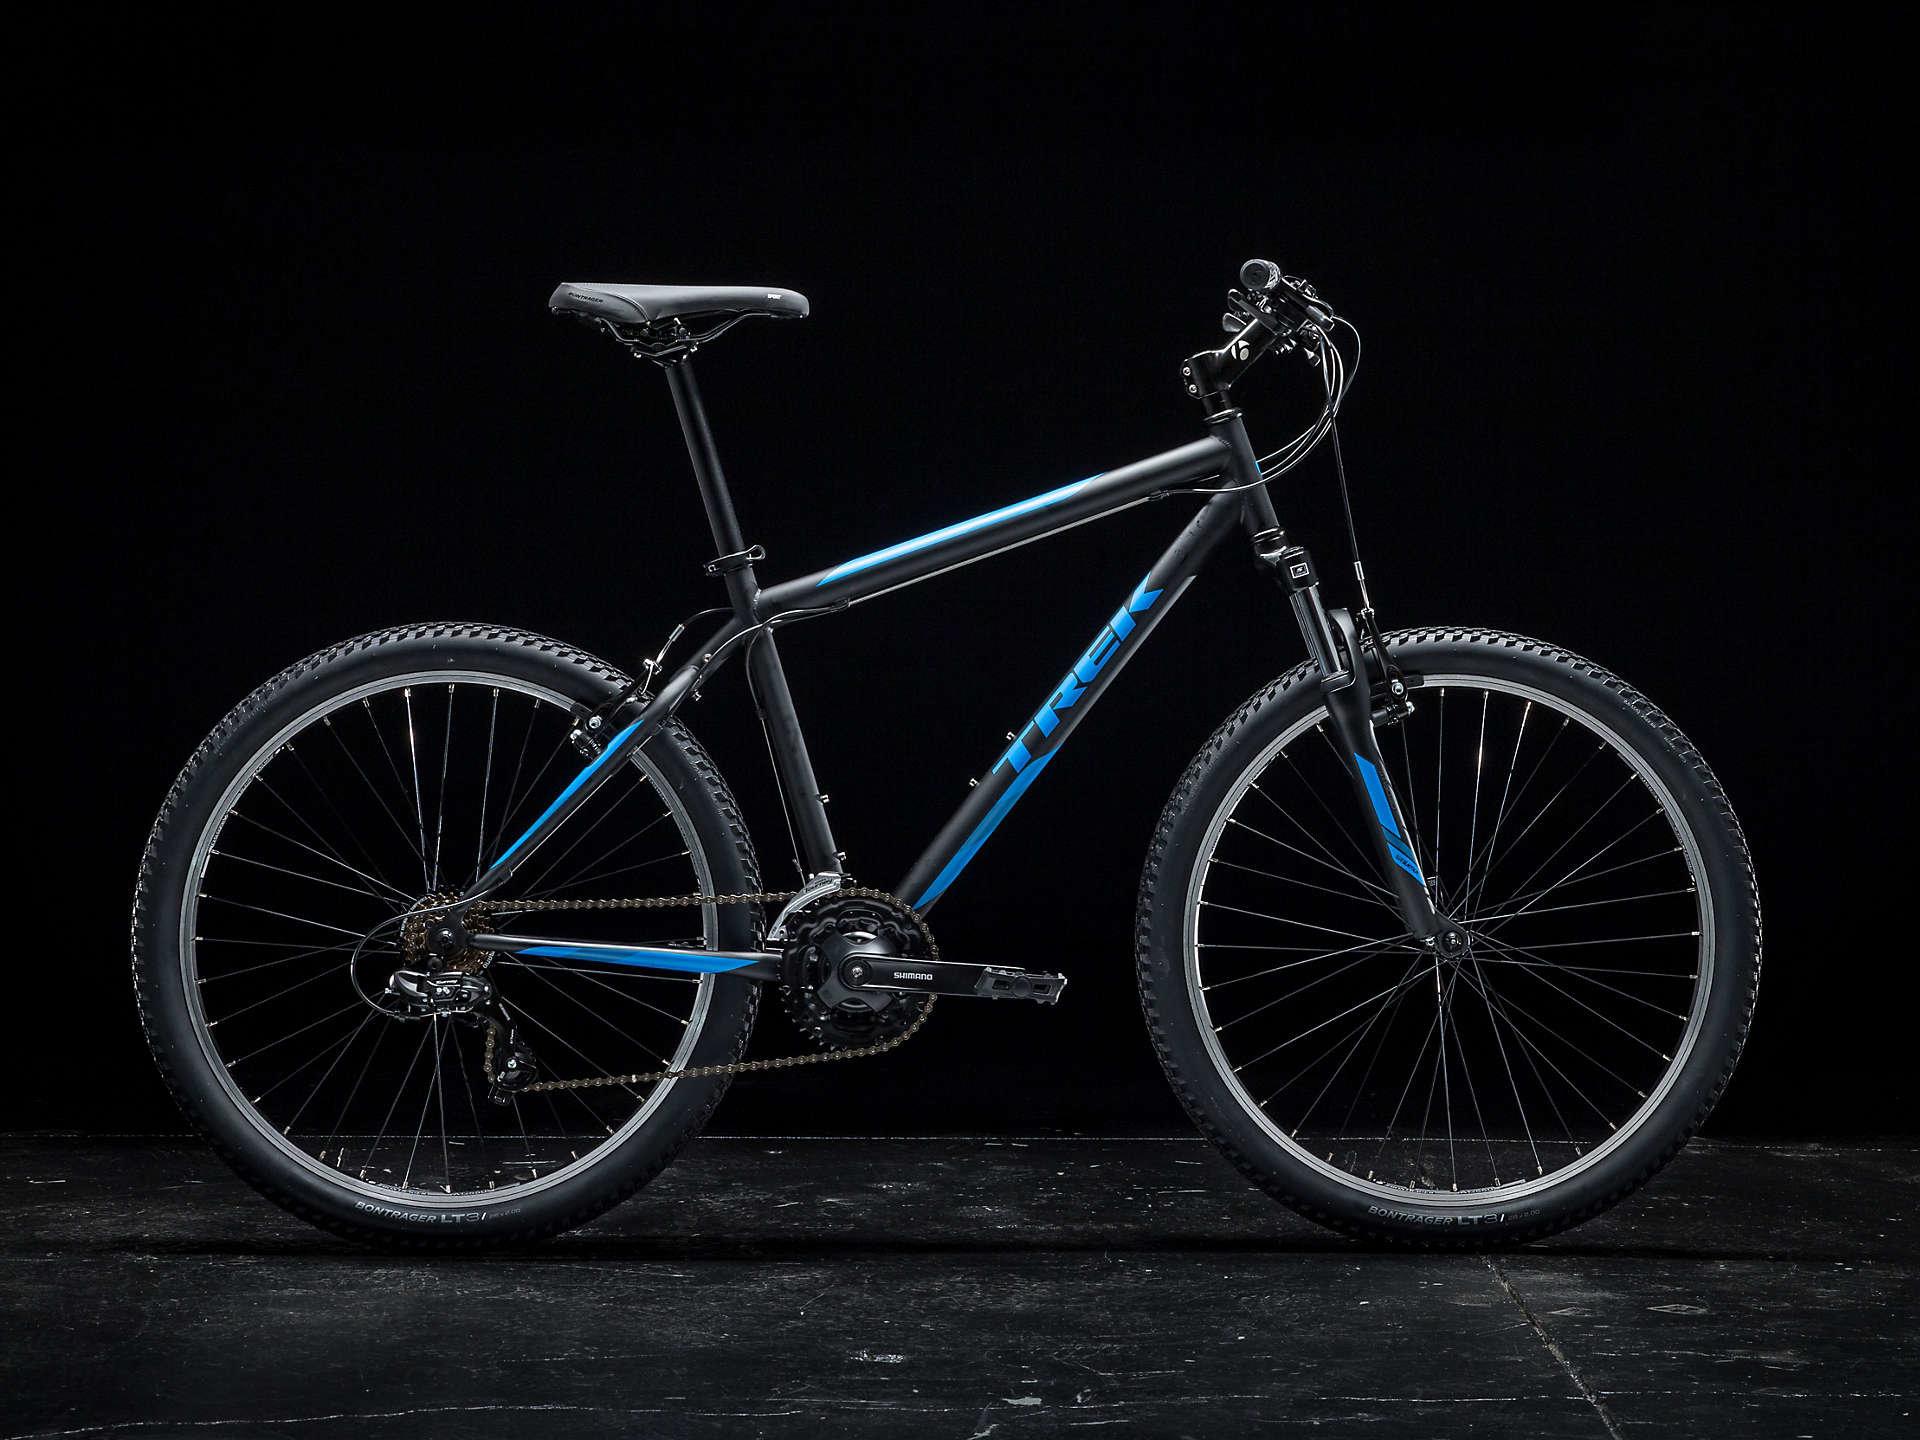 3b17d28d046 Trek 820 - Southern California Bike Shop | Jax Bicycle